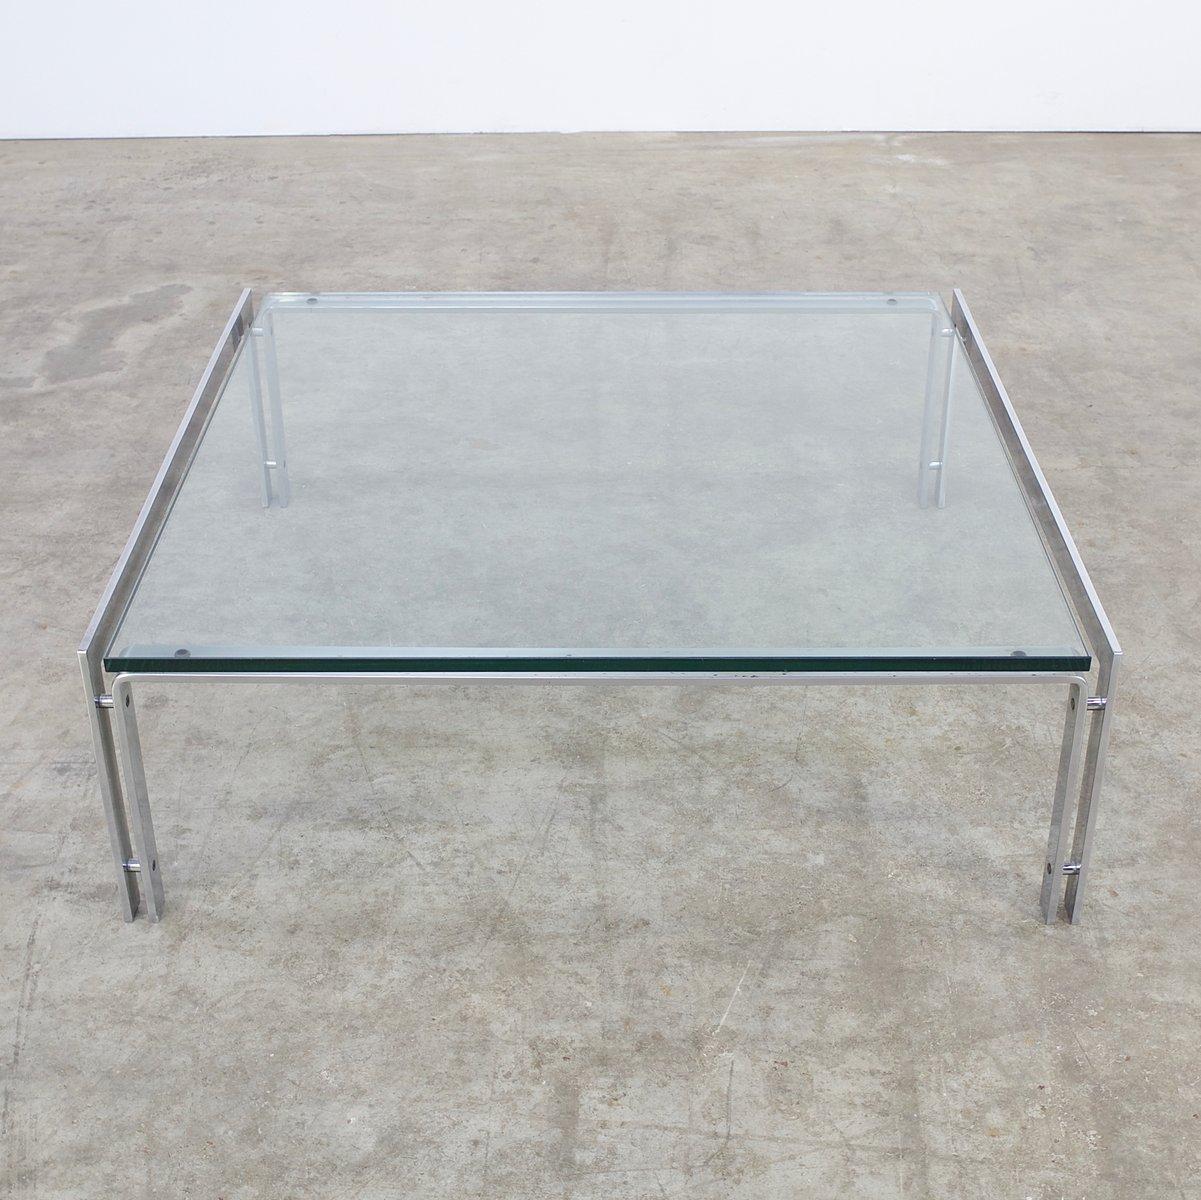 m glass  chrome coffee table from metaform s for sale at pamono - m glass  chrome coffee table from metaform s   price perpiece